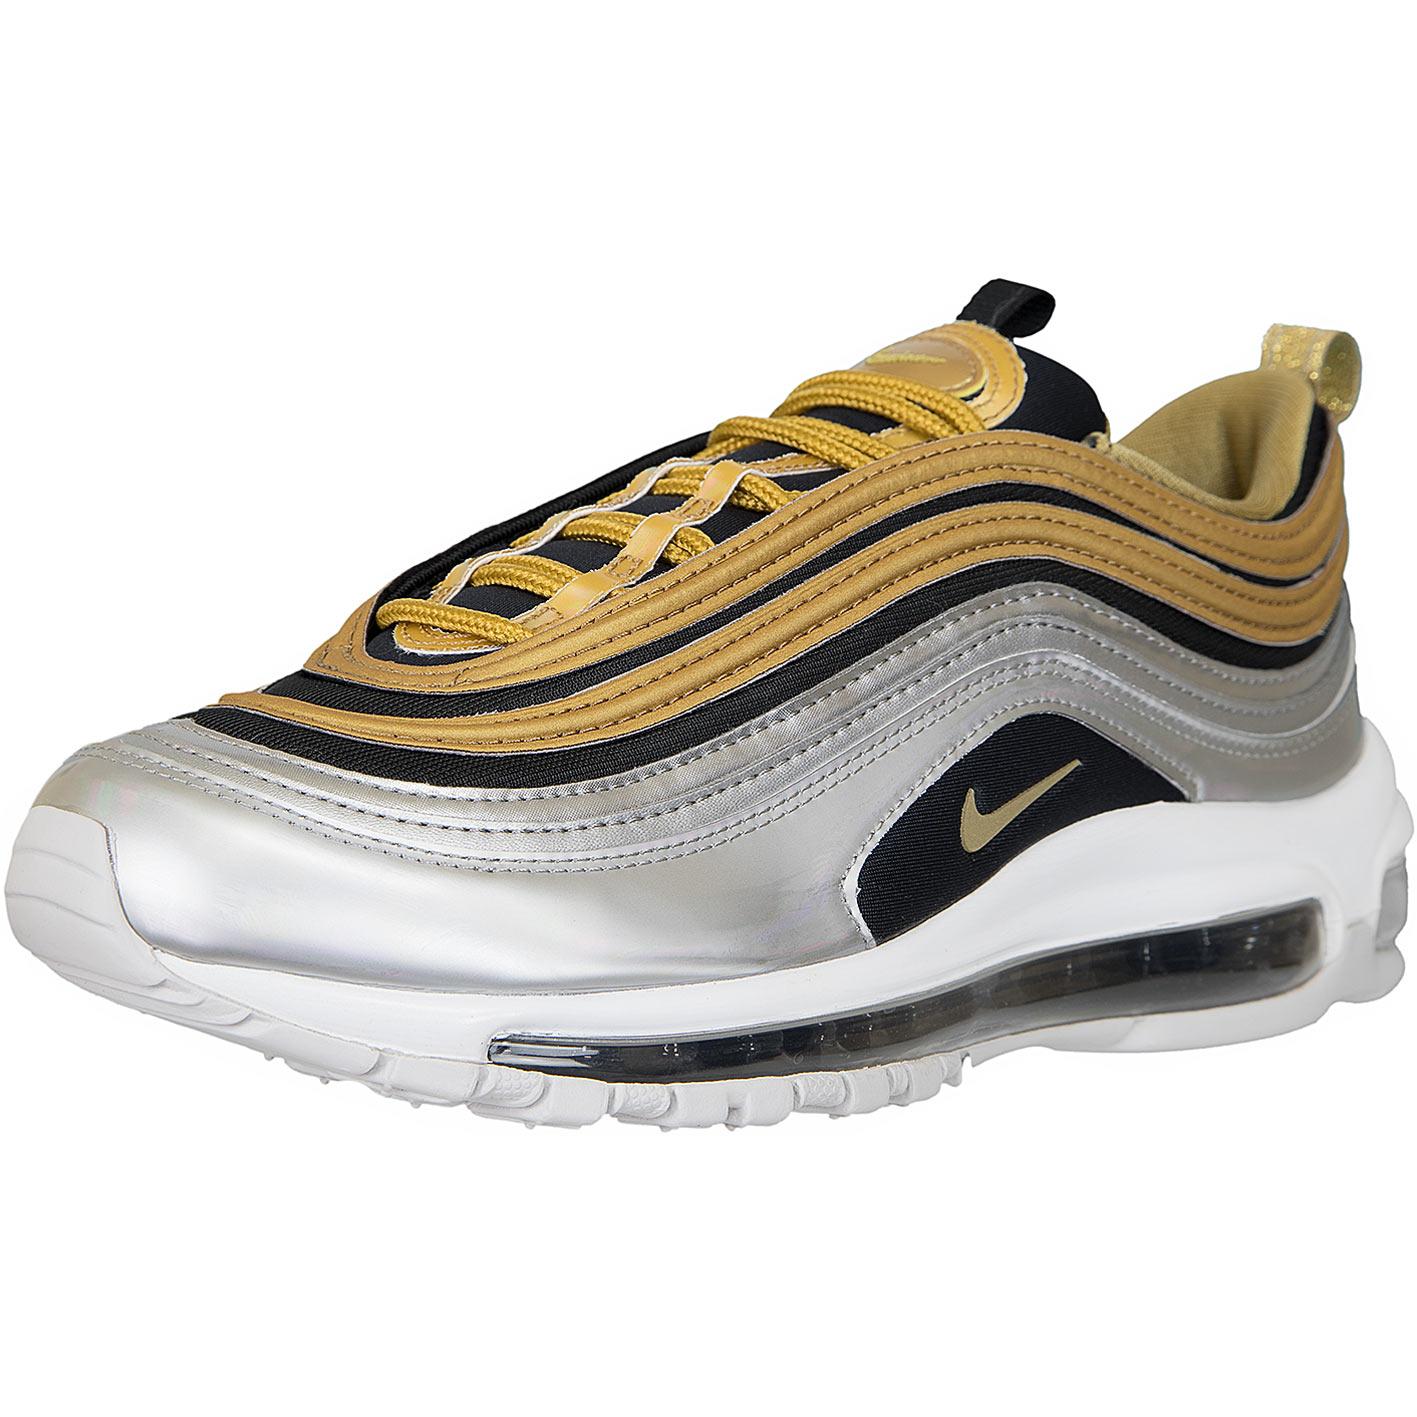 97 Max silbergold Sneaker Air Nike Damen SE Yb6y7fvIgm